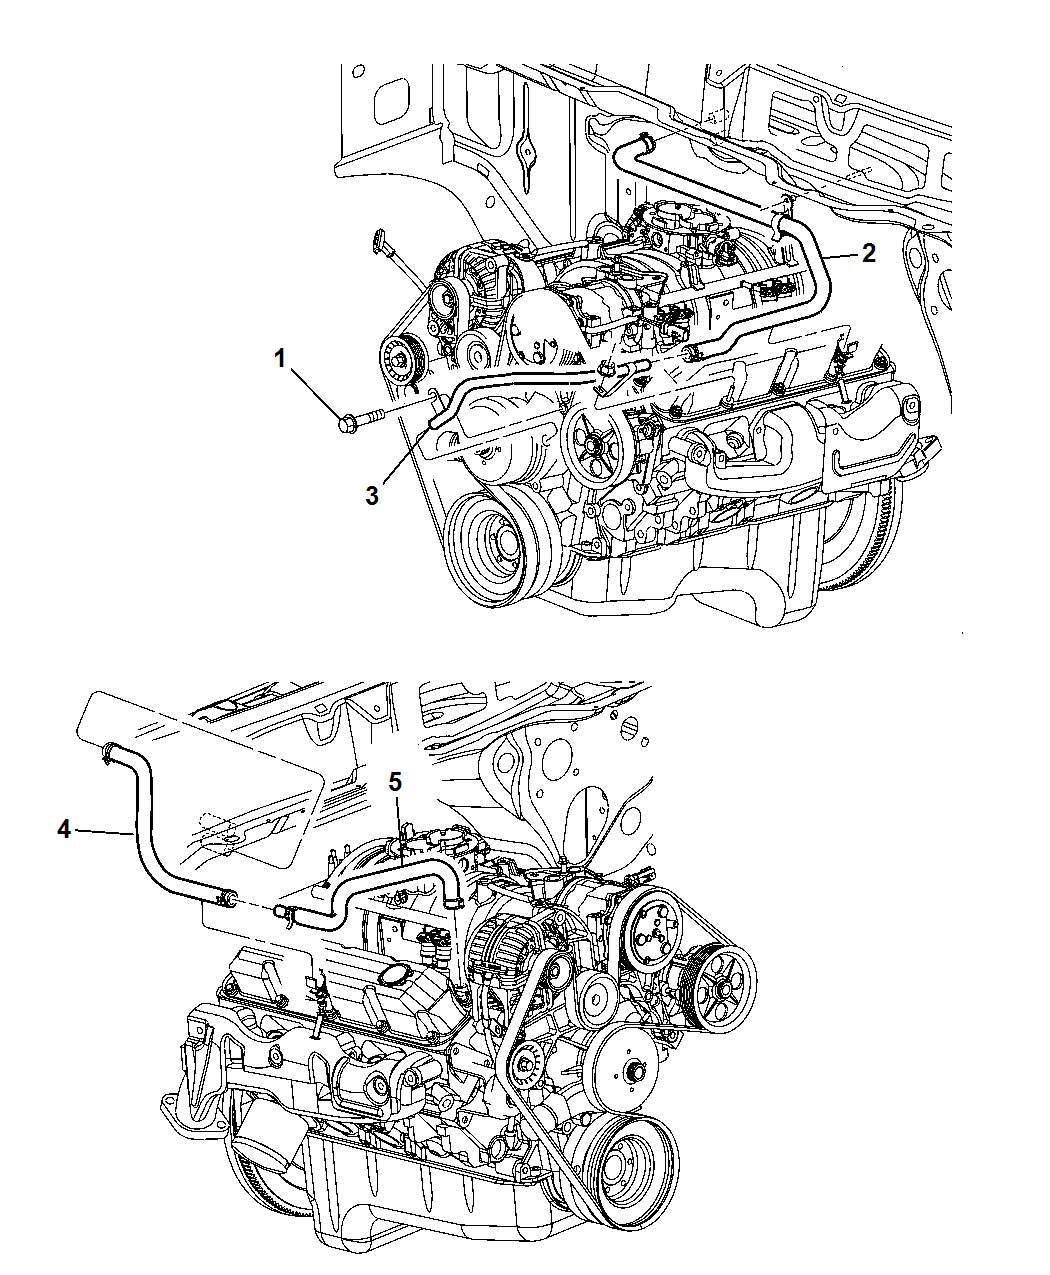 Dodge Ram 4 7 Engine Diagram - Database Wiring Mark end-zero -  end-zero.vascocorradelli.itend-zero.vascocorradelli.it